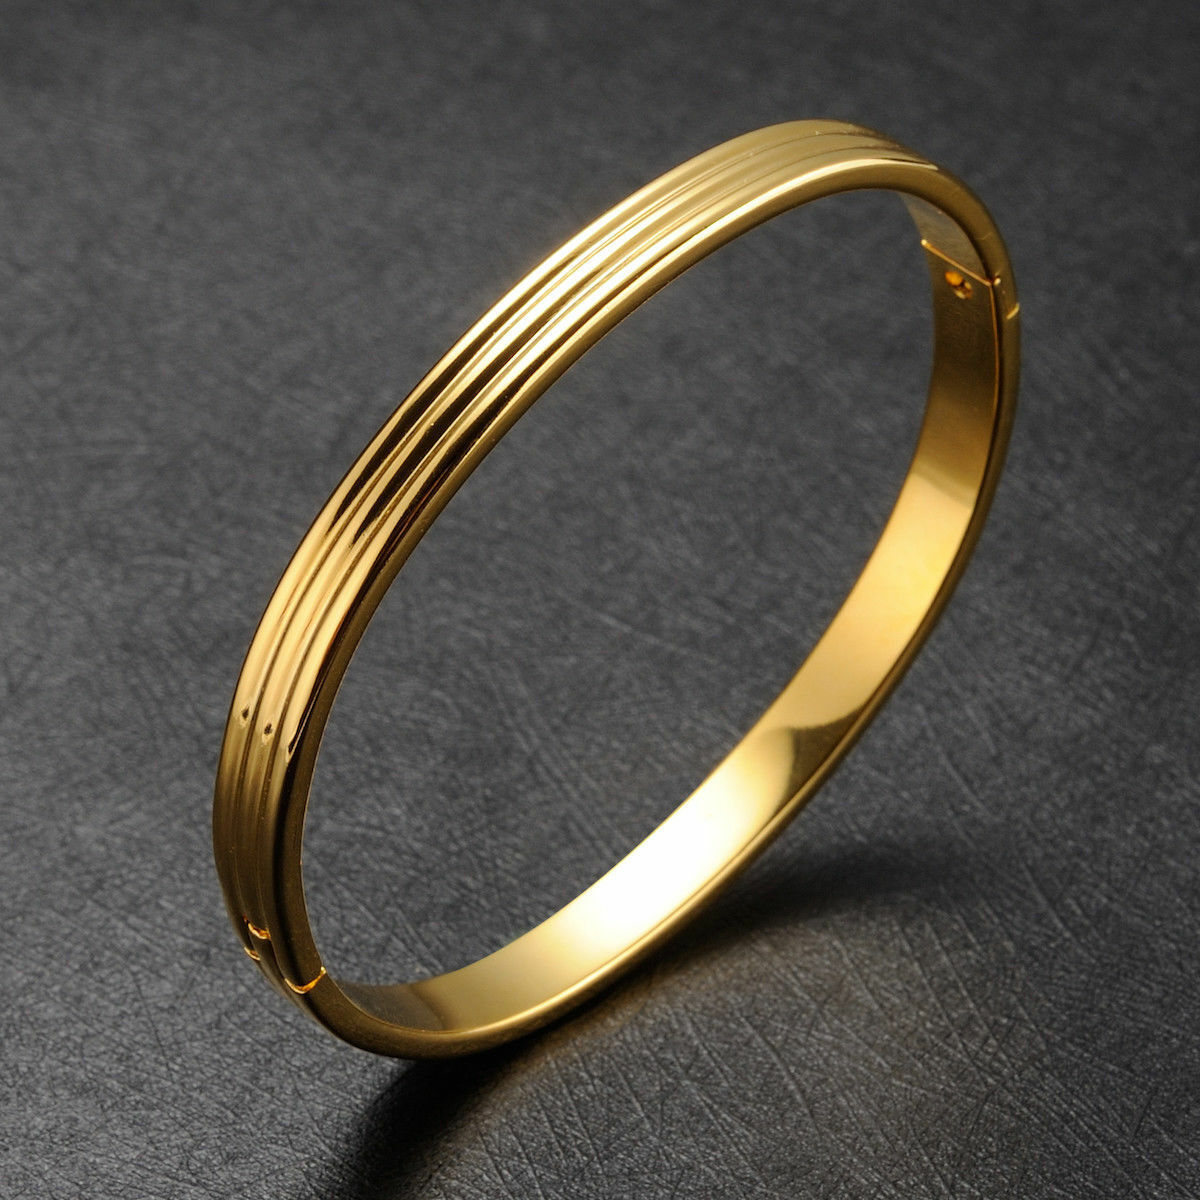 Damen Gold Glitzer Oval Armspange Armband 24 Karat 999er Gold Vergoldet Armreif